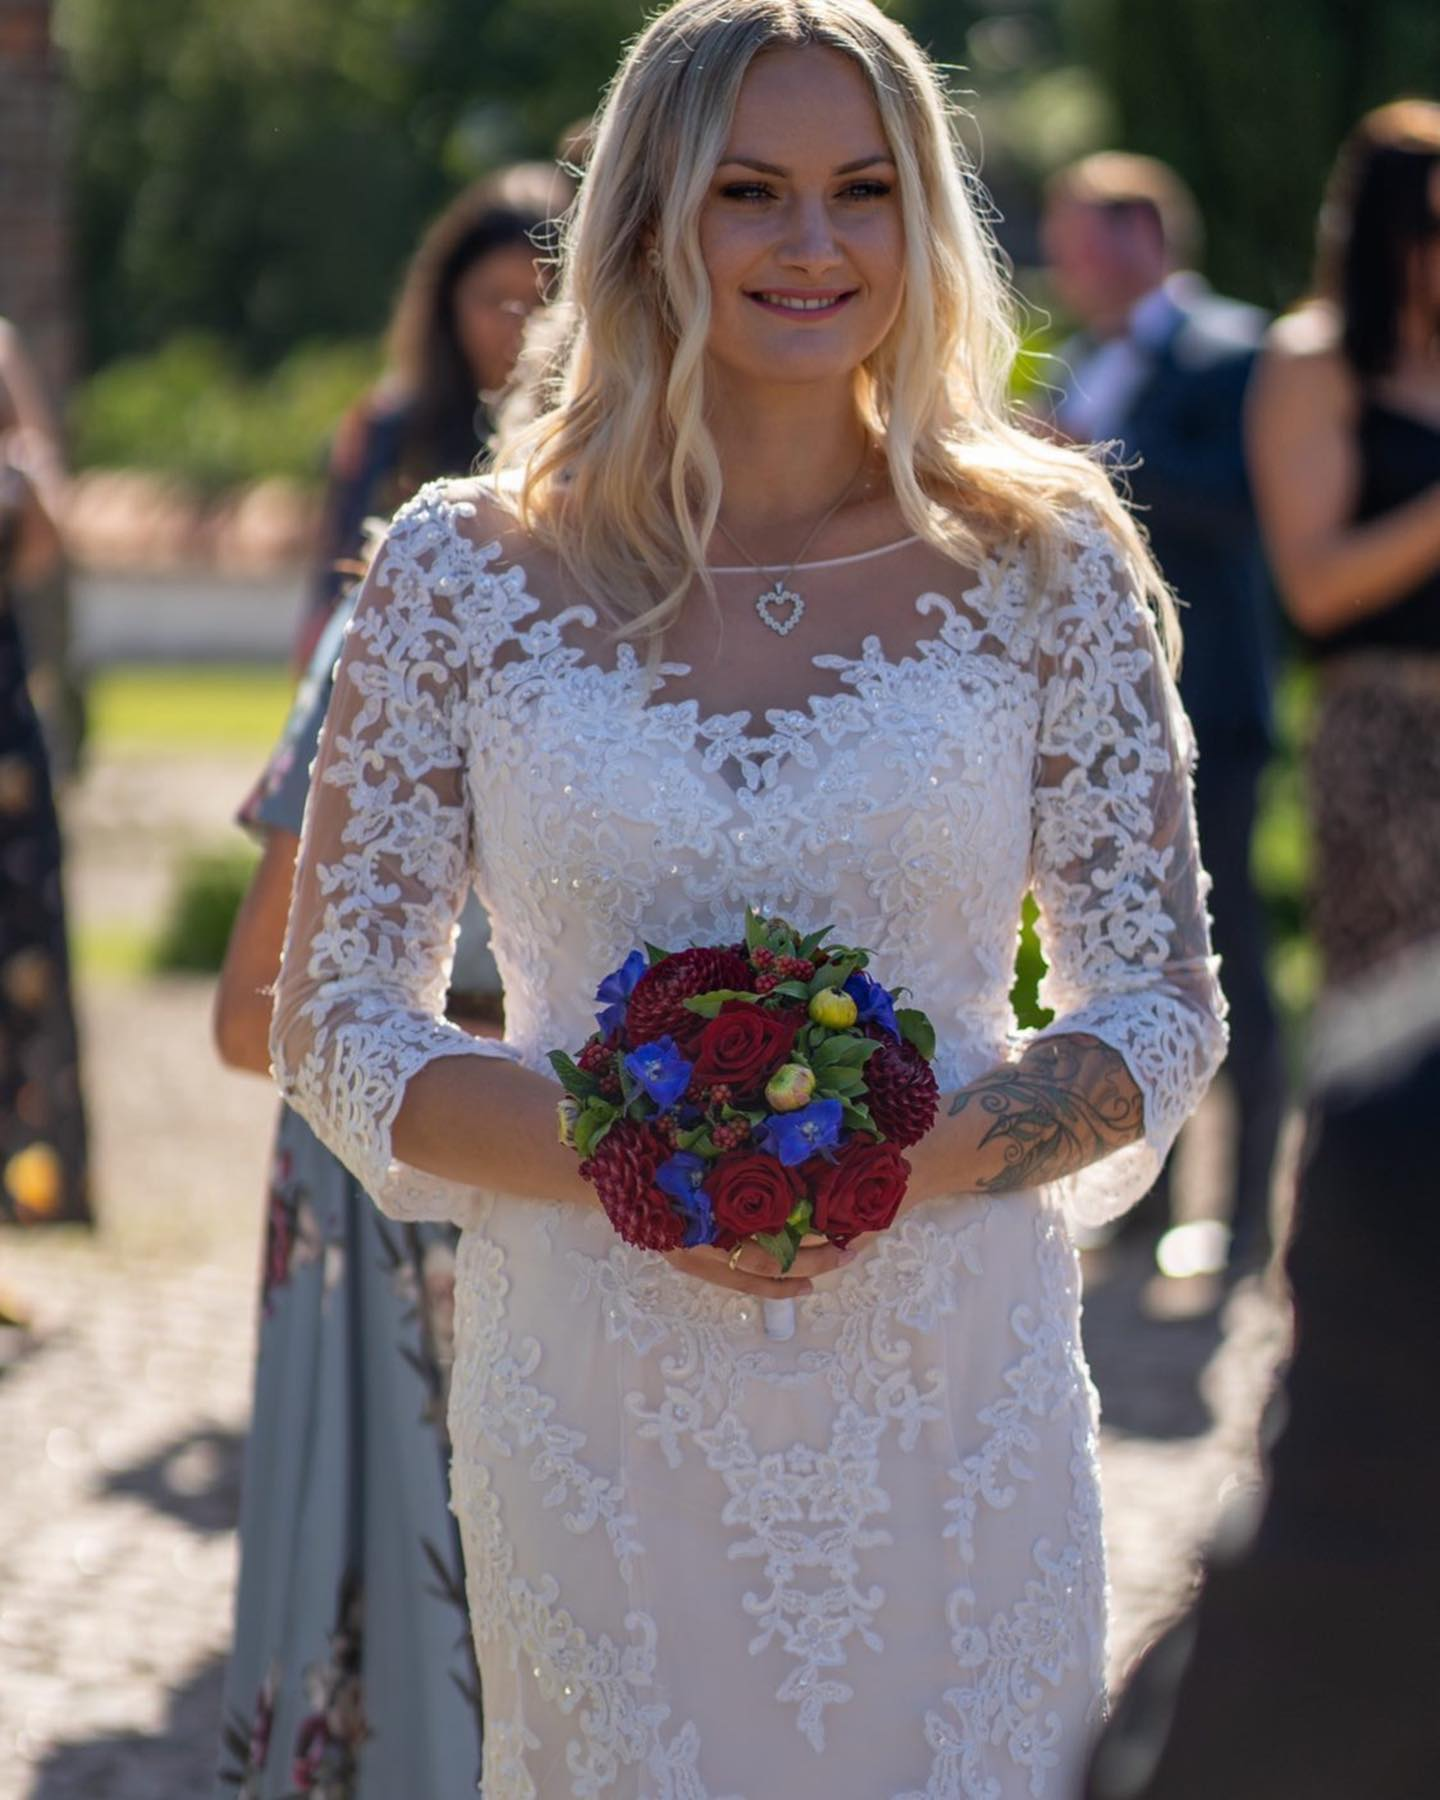 Flot Kjoler | Køb en flot kjole online | Se det store udvalg og få XZ-63